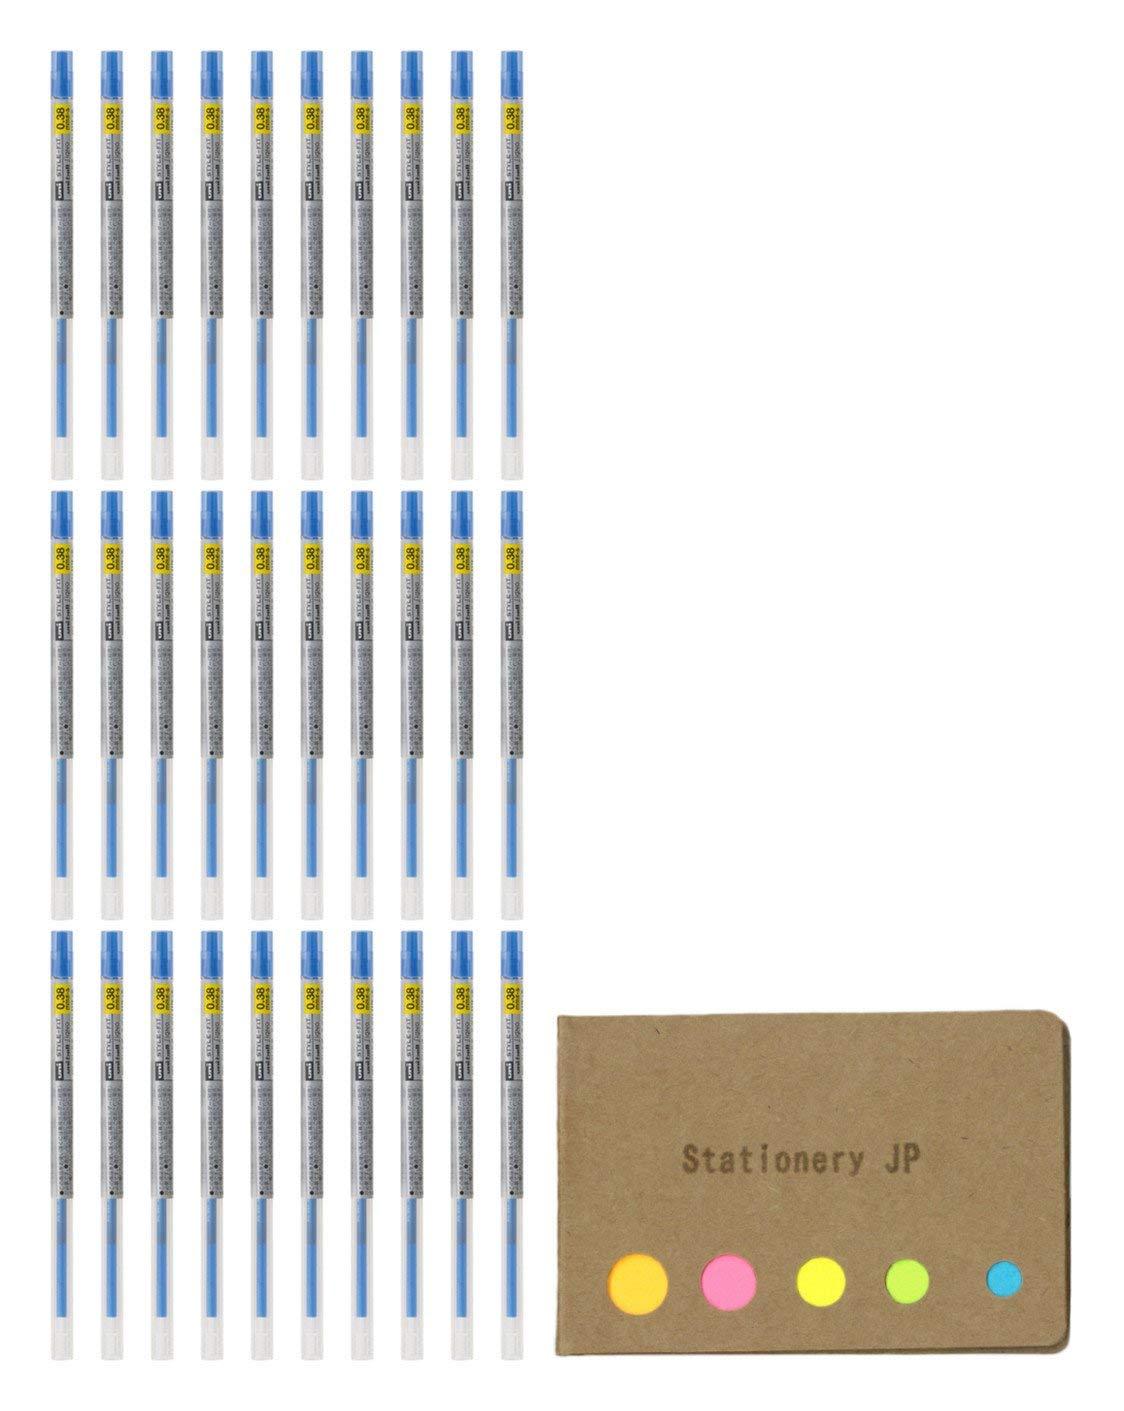 Uni-ball Signo Gel Ink Refills for Uni Style Fit Gel Multi Pen 0.38mm Blue Ink, 30-pack, Sticky Notes Value Set